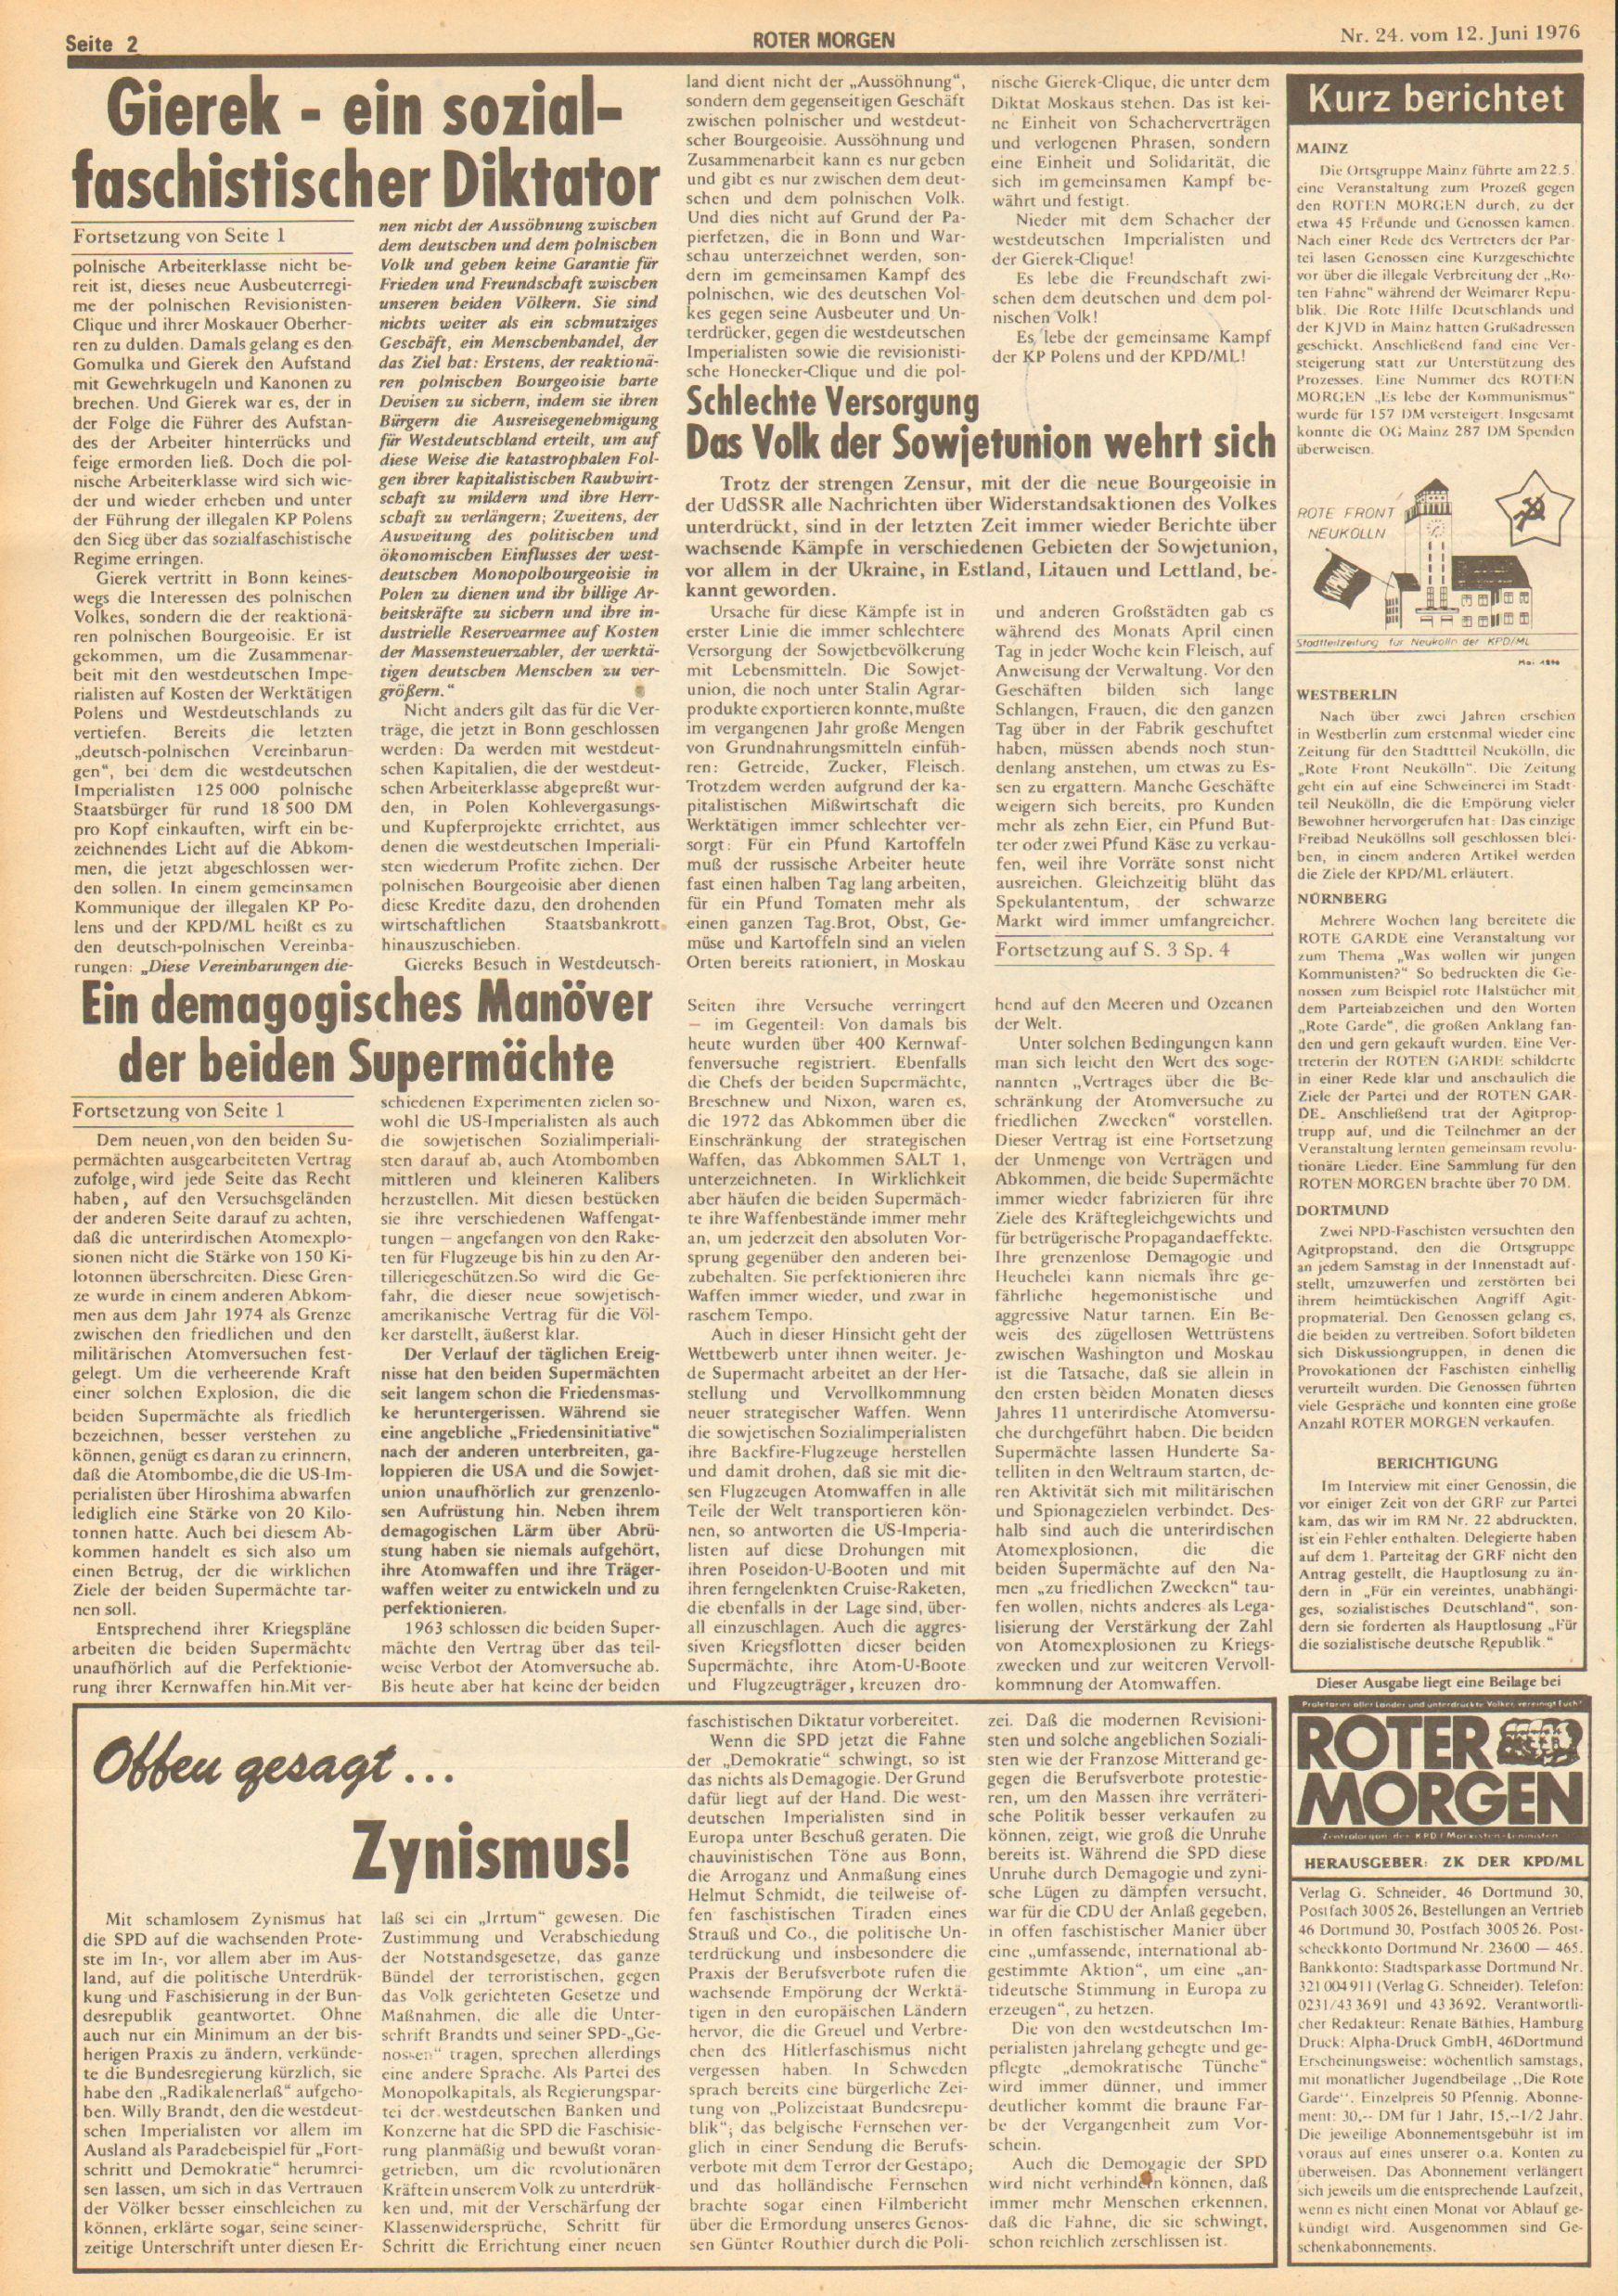 Roter Morgen, 10. Jg., 12. Juni 1976, Nr. 24, Seite 2